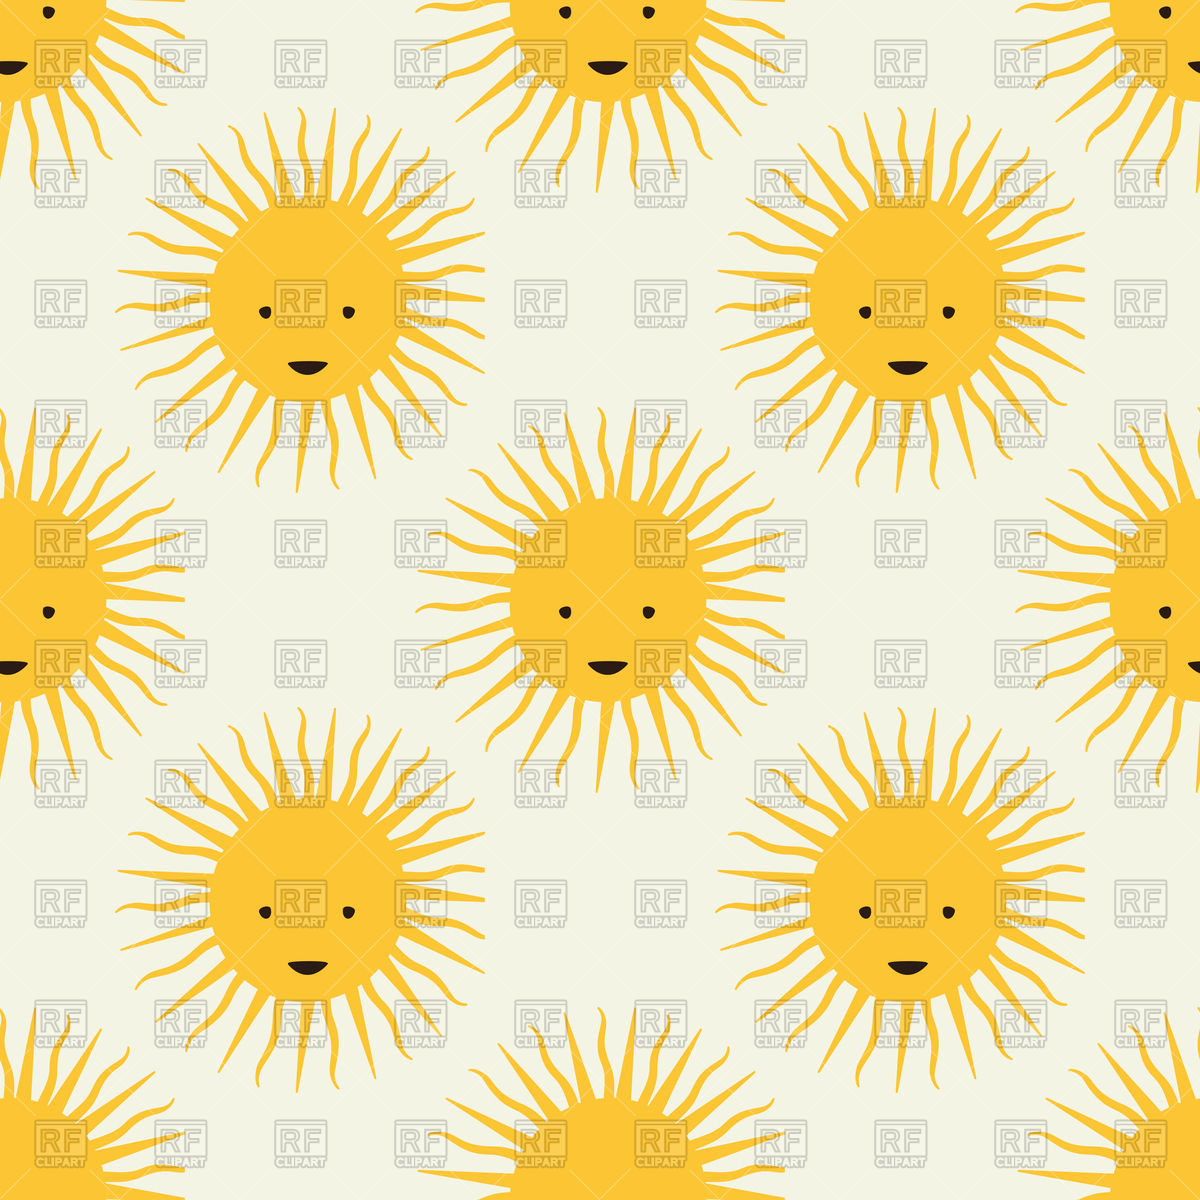 1200x1200 Childish Seamless Pattern With Cartoon Sun Vector Image Vector